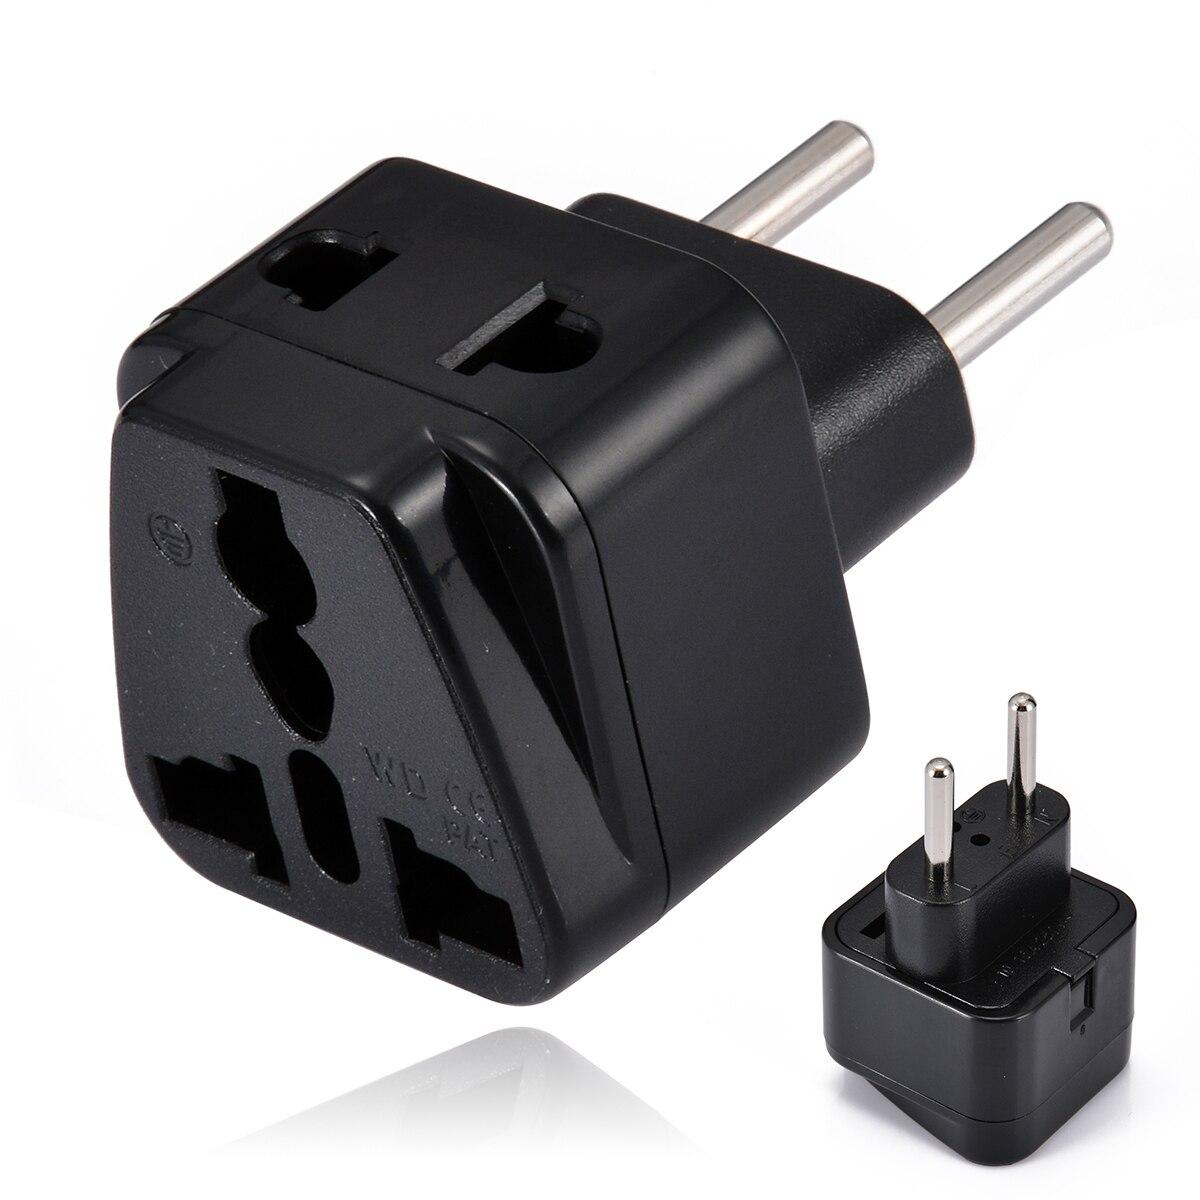 Mayitr Electric Plug Universal Travel Socket 1 to 2 UK/US/EU/AU Outlet to EU/Brazil/Israel Splitter Plug Adapter Charger